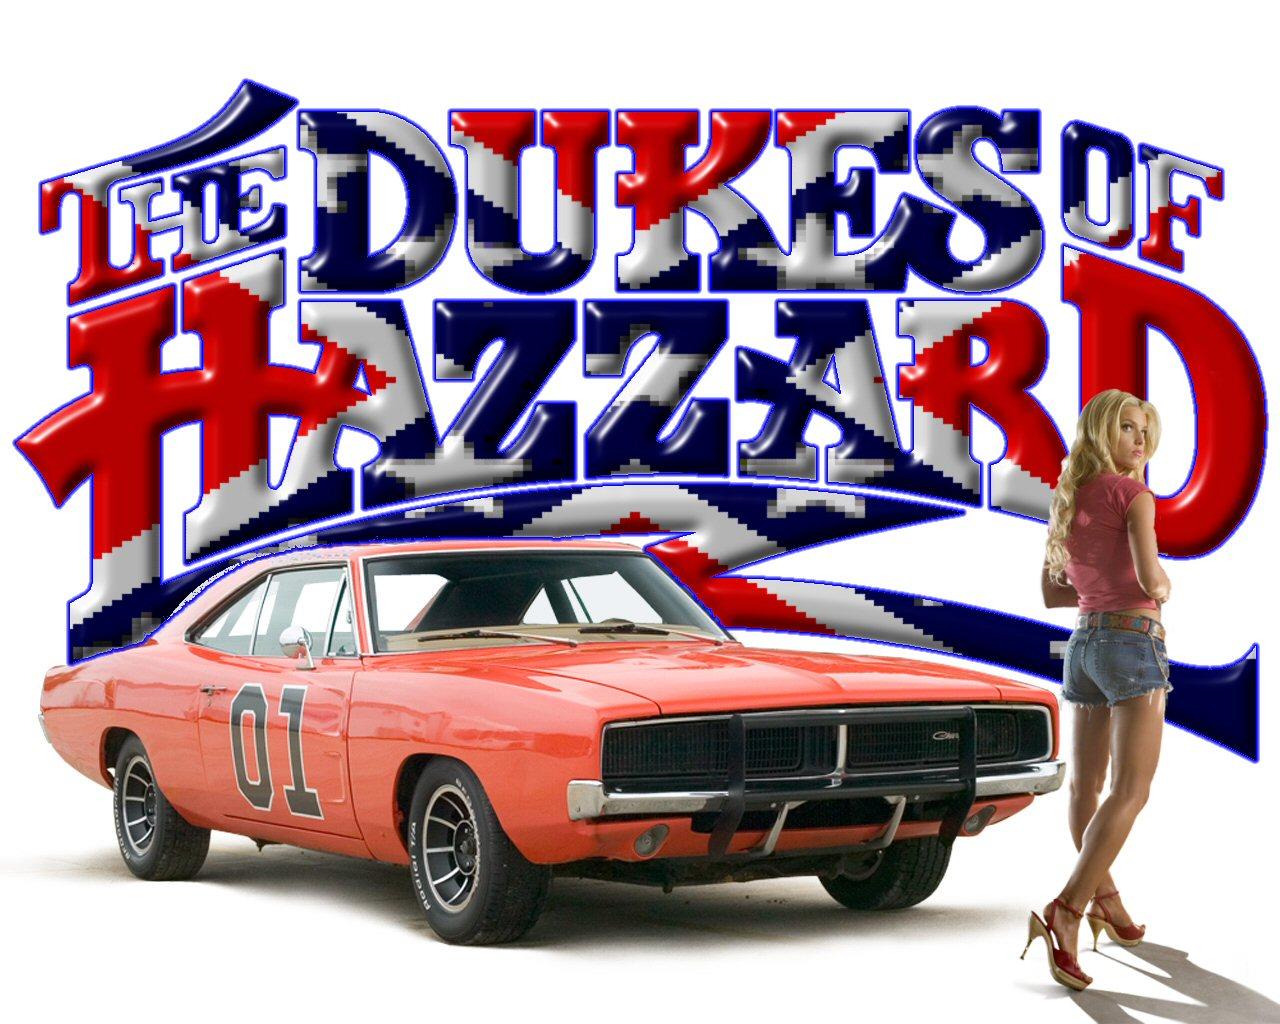 50+] Dukes of Hazzard Wallpaper Border on WallpaperSafari